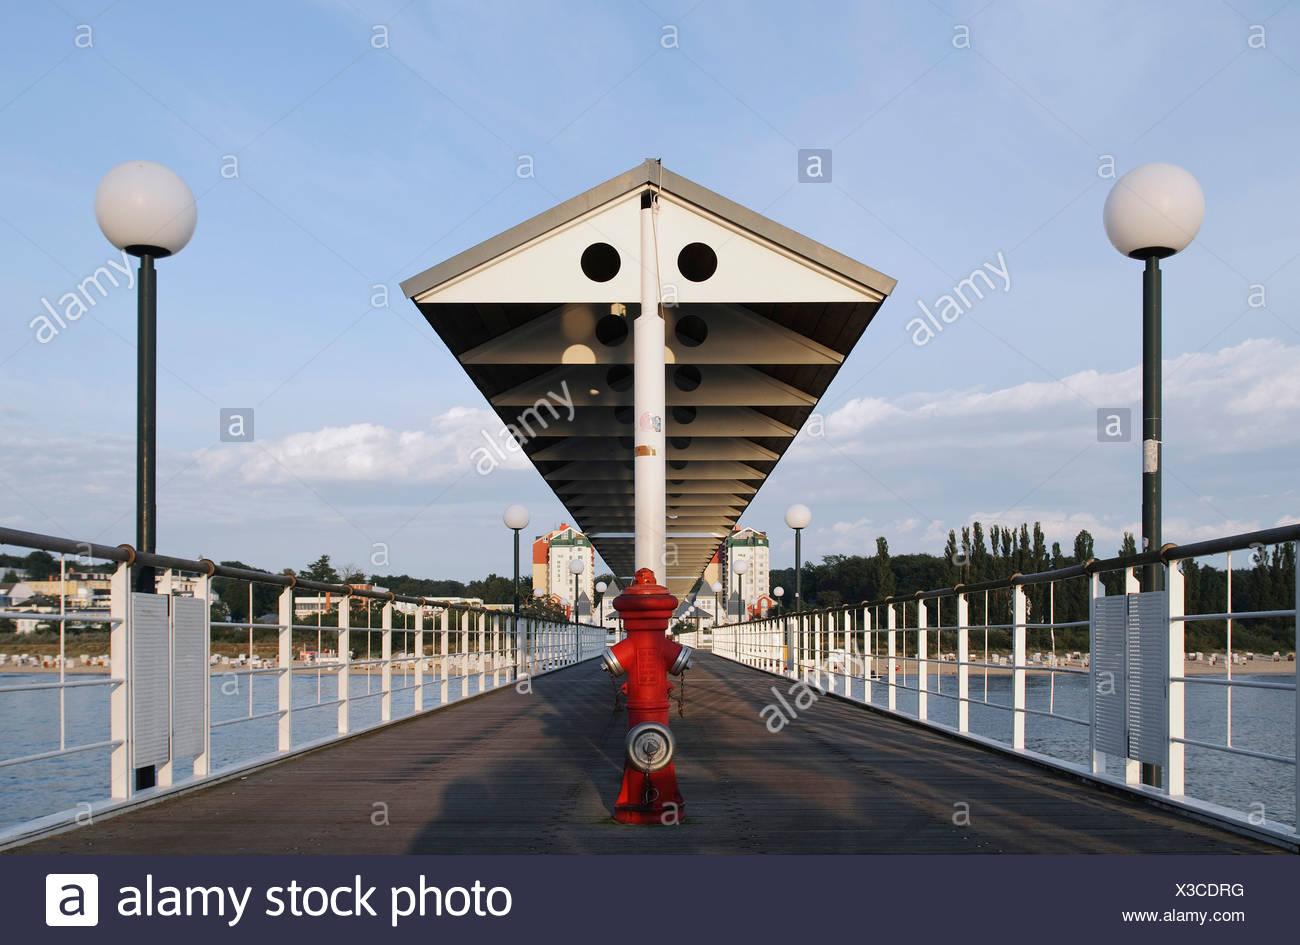 Pier in the Heringsdorf seaside resort, Usedom Island, Mecklenburg-Western Pomerania, Germany, Europe Stock Photo